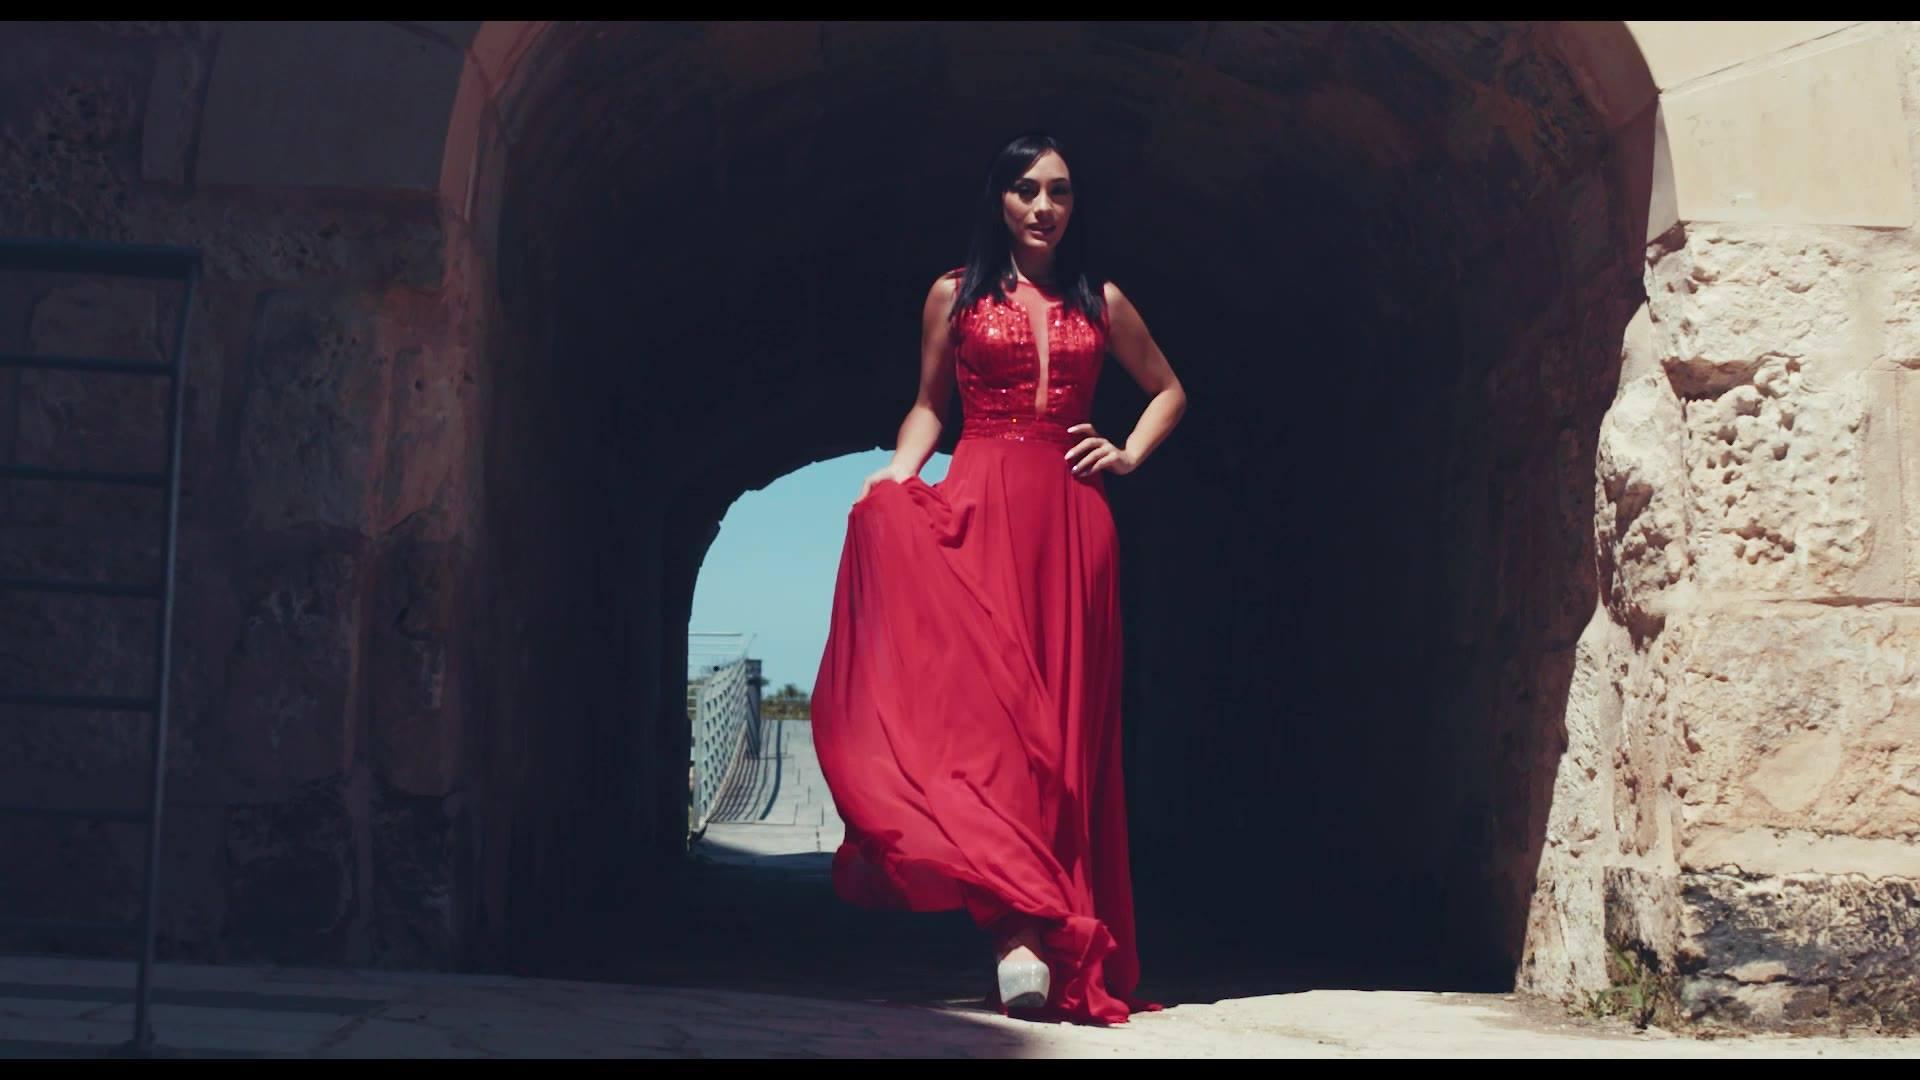 #brand #malta #eveningwear #casualwear #occasionwear #dress